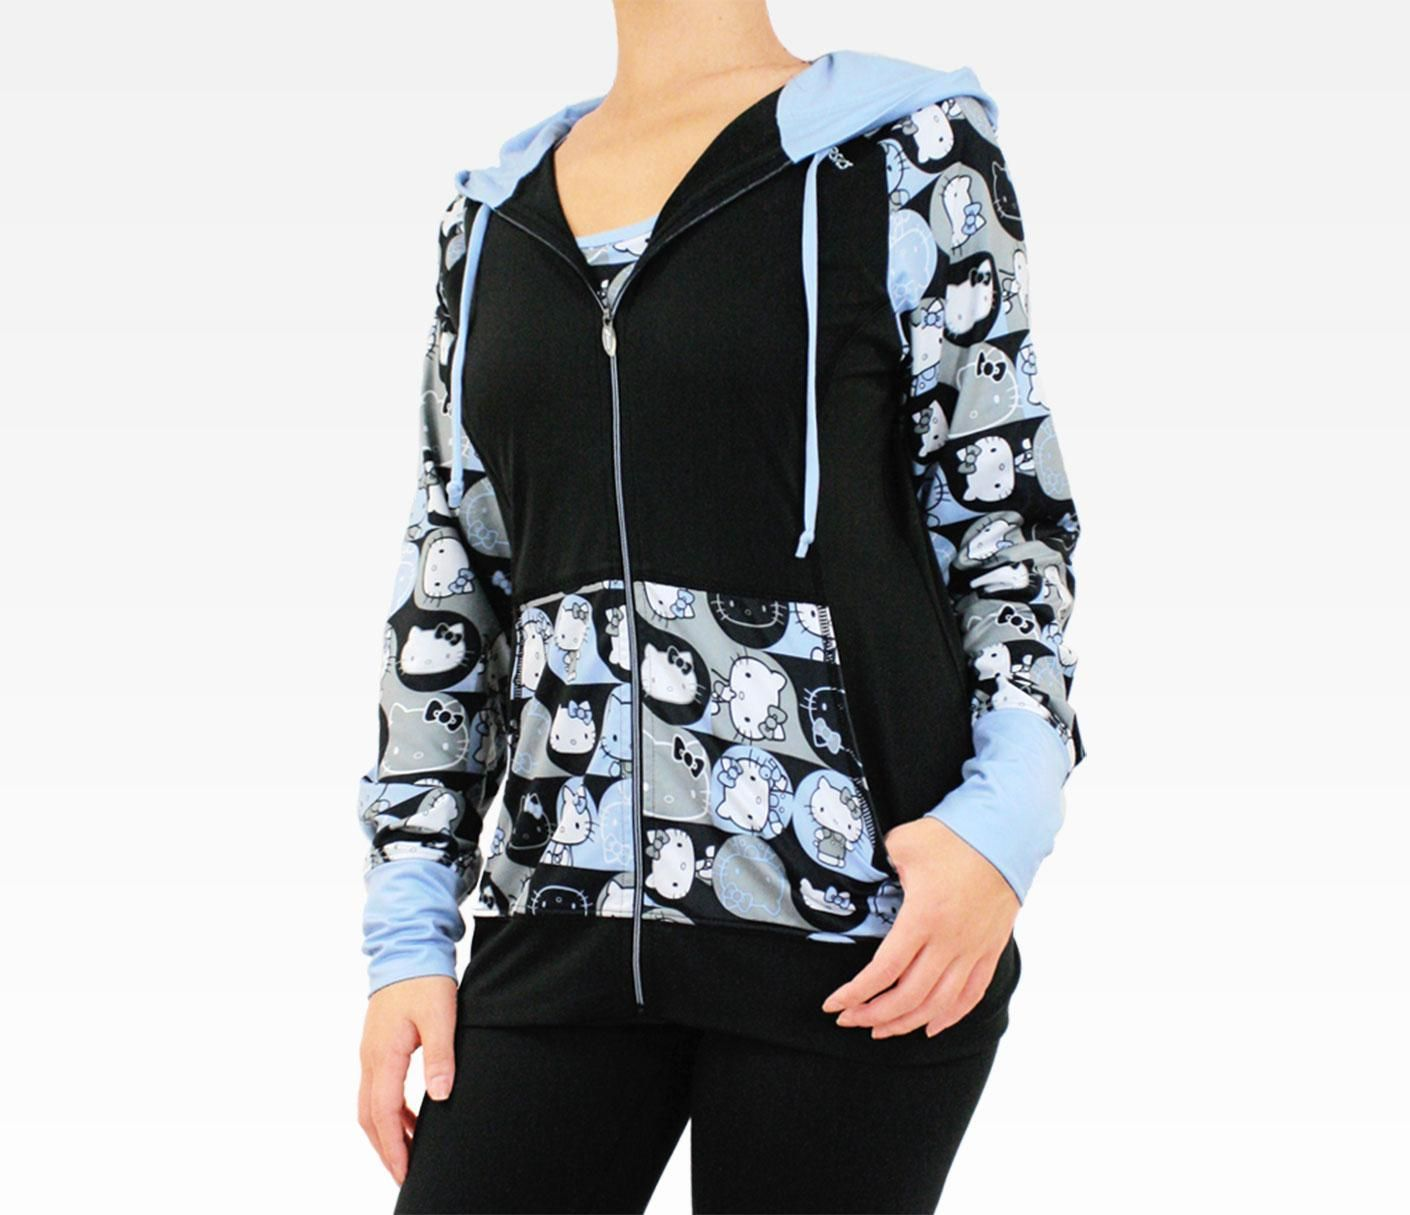 Asics X Hello Kitty Hooded Jacket Blue Hello Kitty Clothes Hooded Jacket Hooded Jacket Blue [ 1215 x 1410 Pixel ]